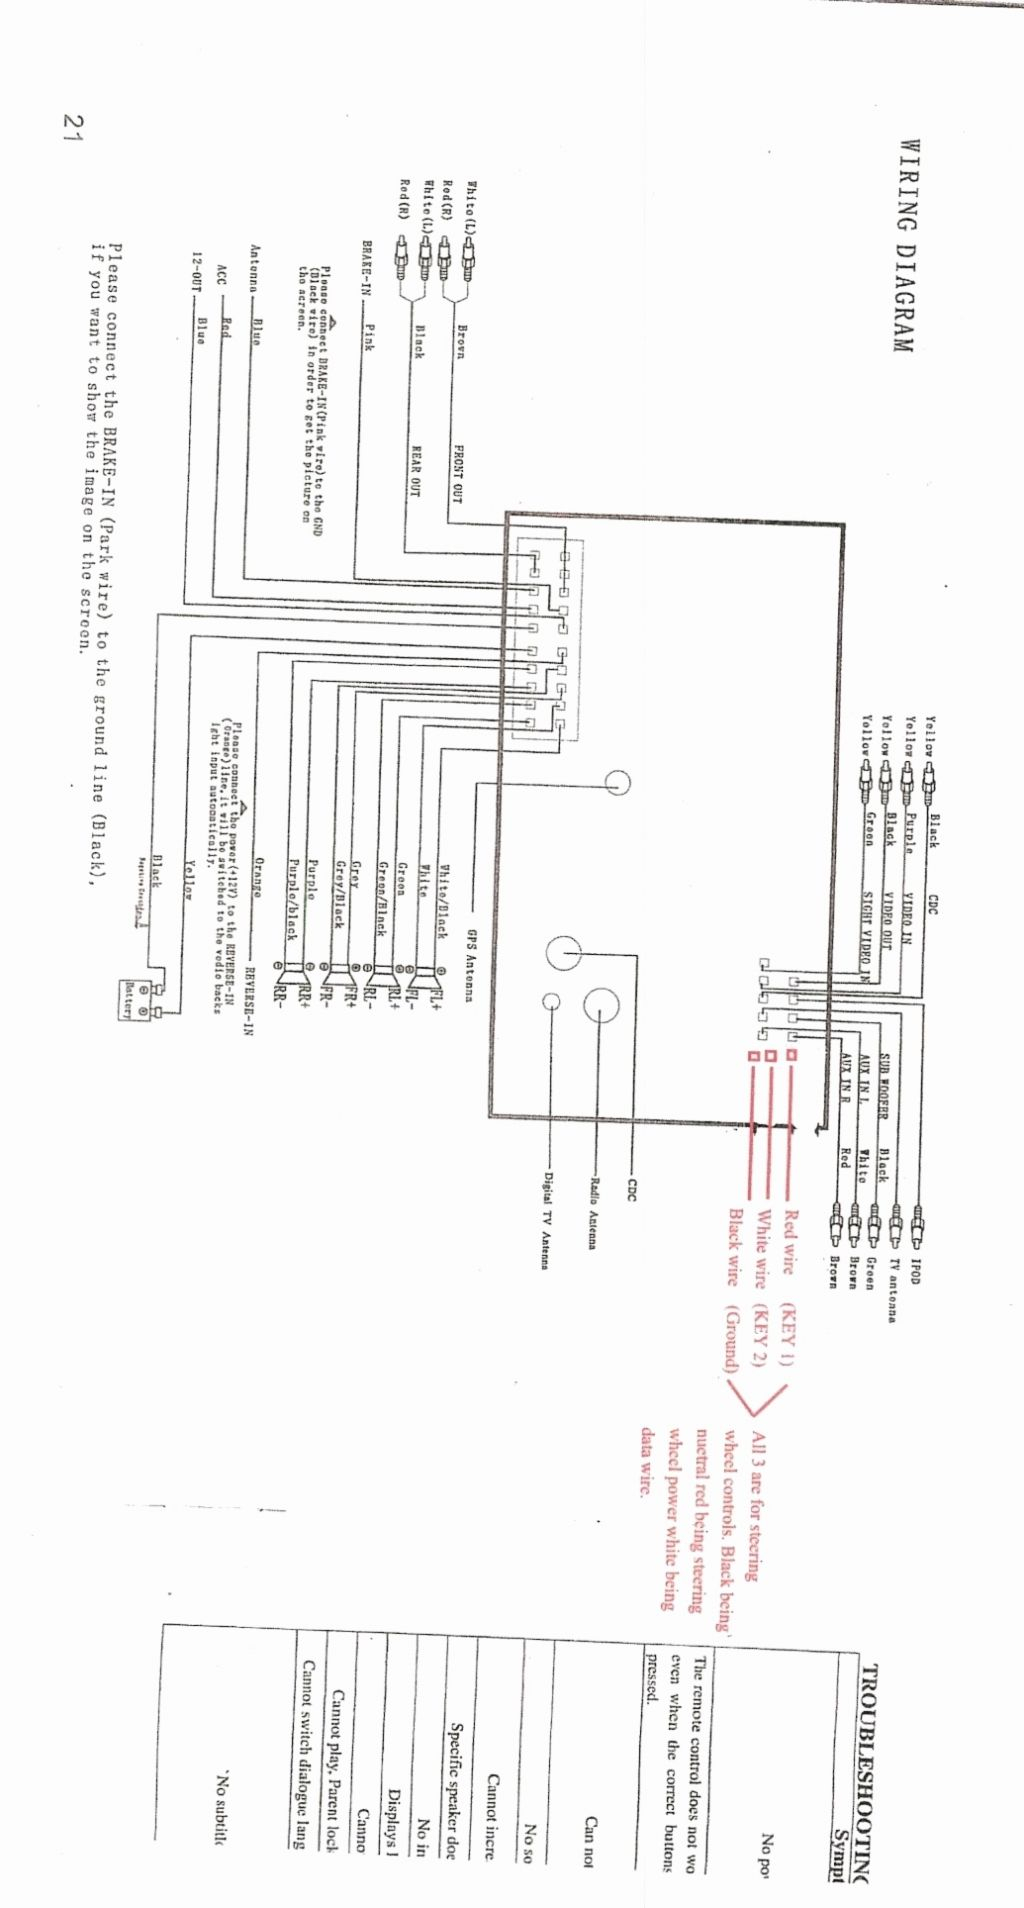 Brilliant Axxess Gmos 01 Wiring Diagram Axxess Gmos 01 Gmos01 Onstar Circuit Wiring Cloud Histehirlexornumapkesianilluminateatxorg